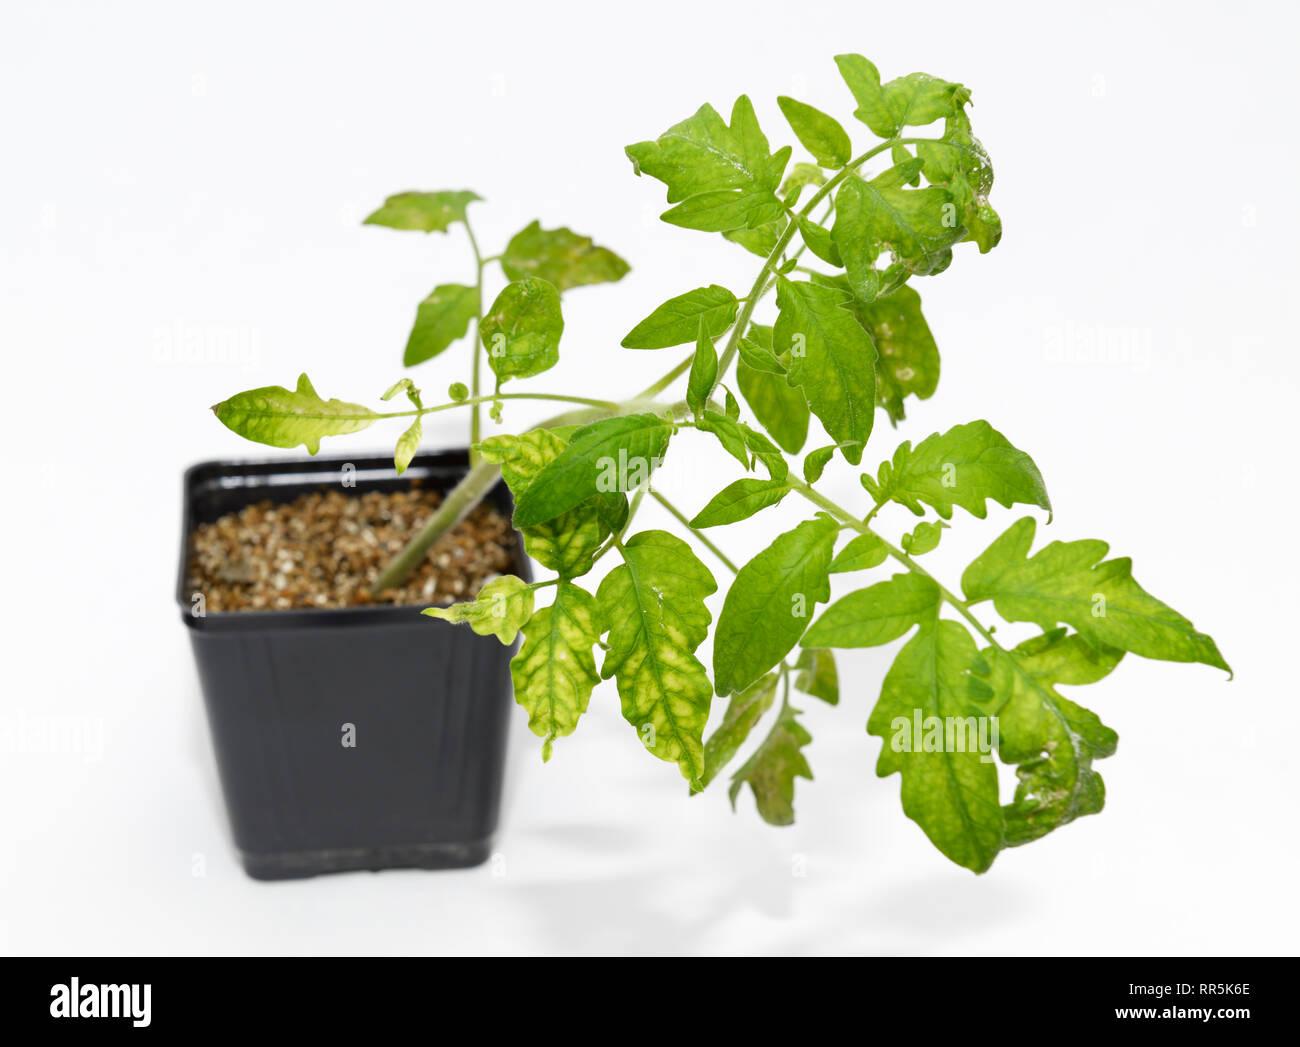 Tobacco Mosaic Virus, TMV, infected plant - Stock Image